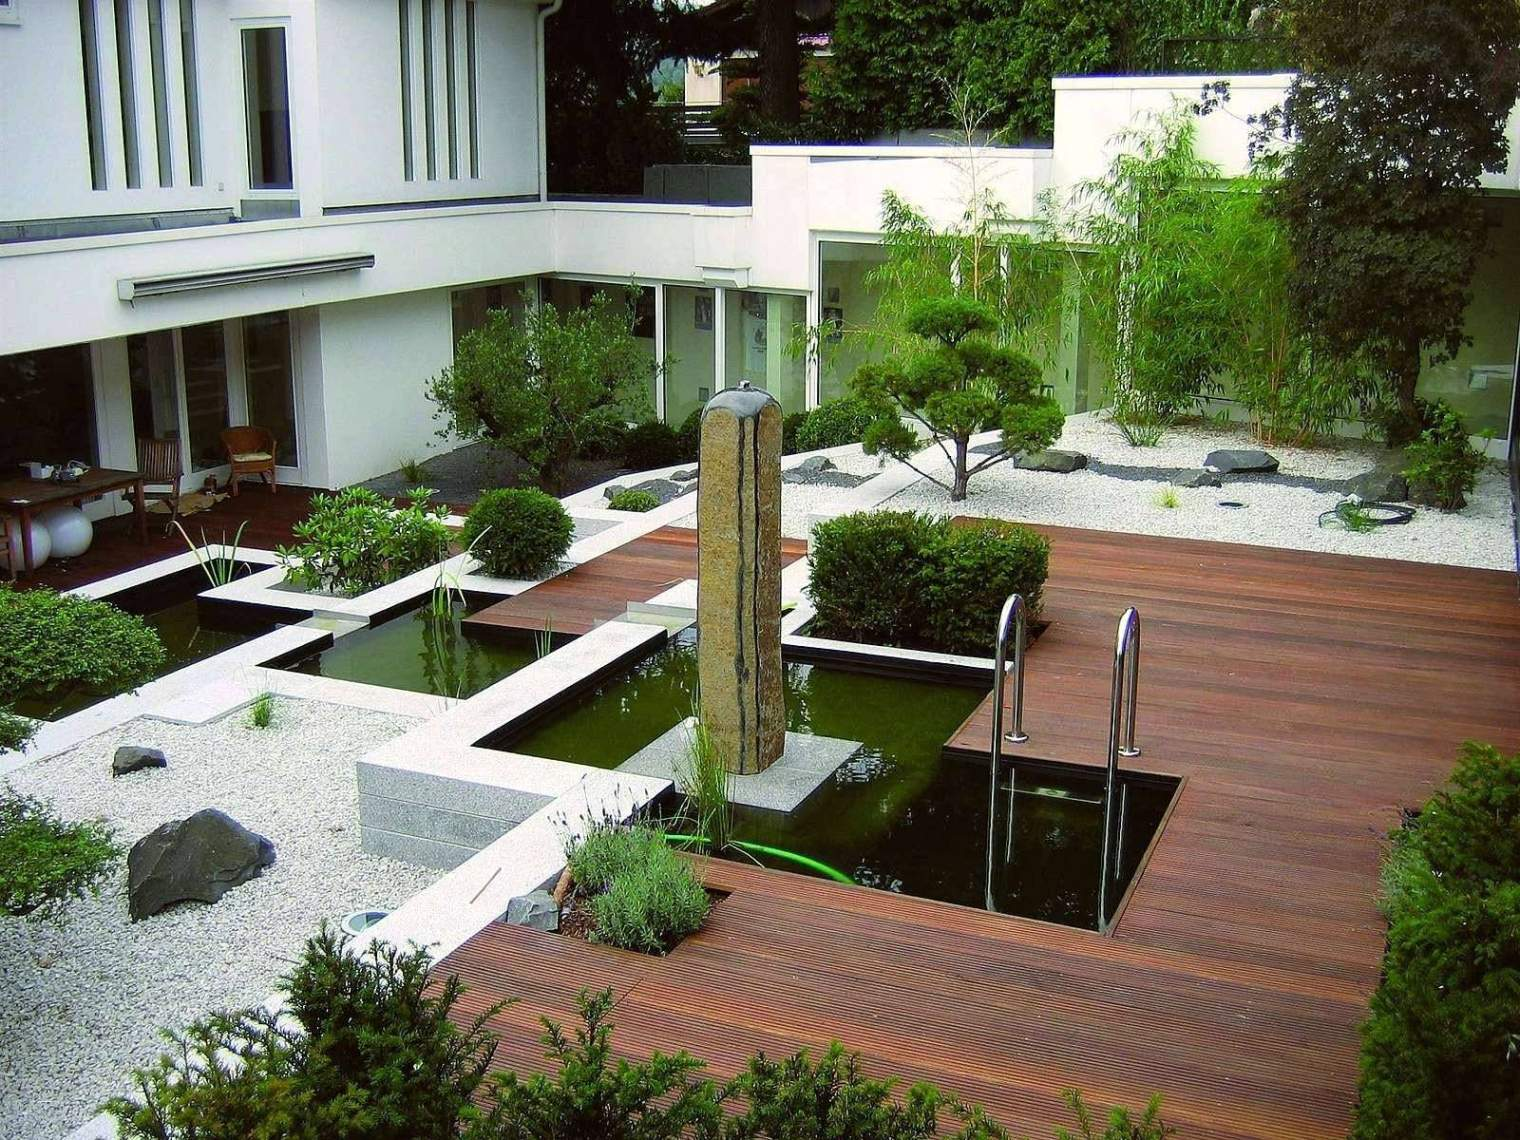 Winter Garten Elegant Wintergarten Mediterran Gestalten — Temobardz Home Blog